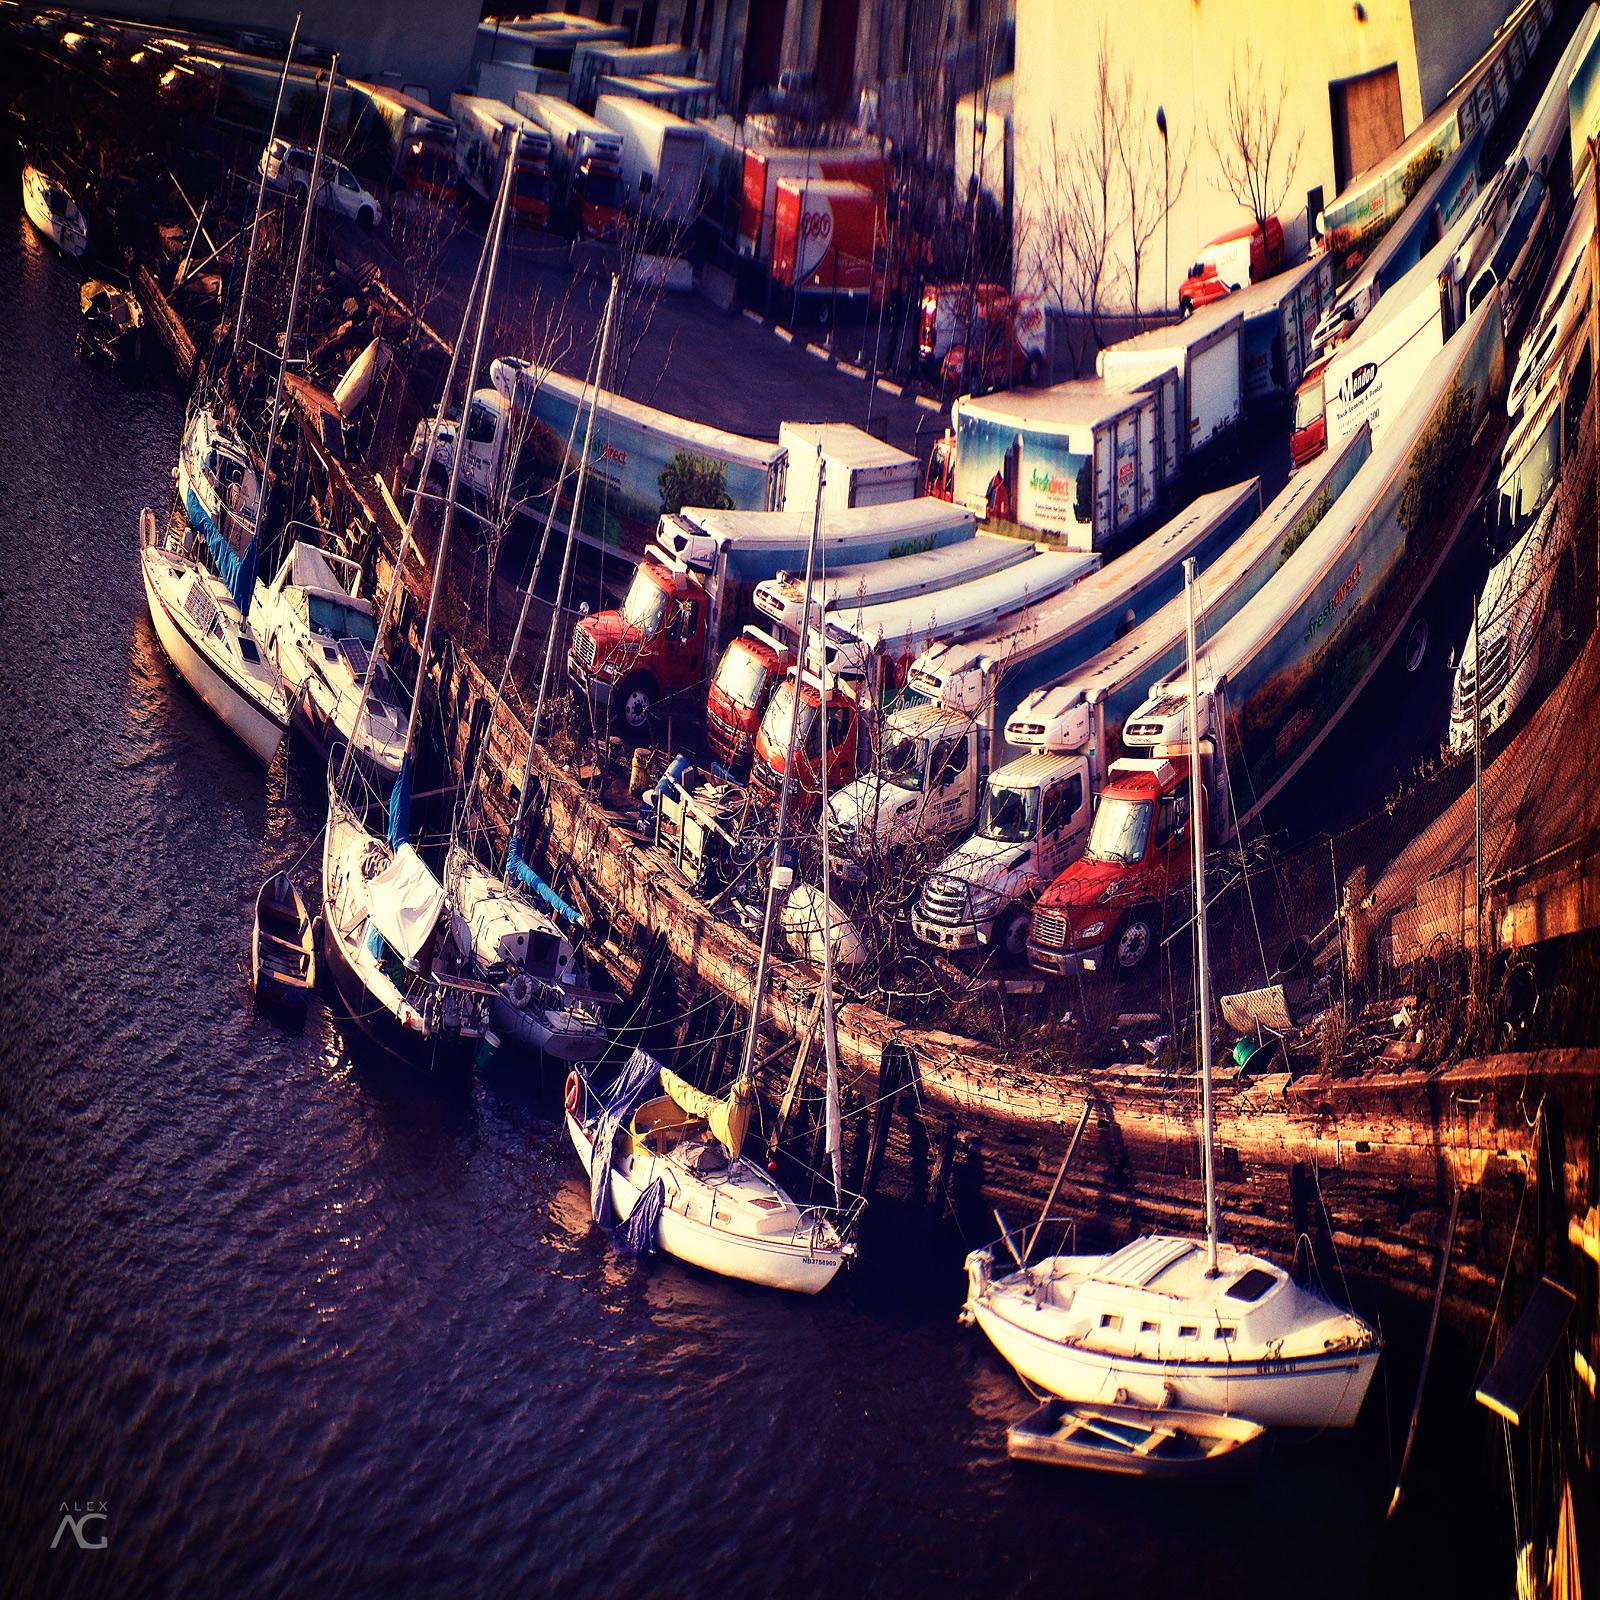 BoatsNearKoztuschkoBridge_warped_1600